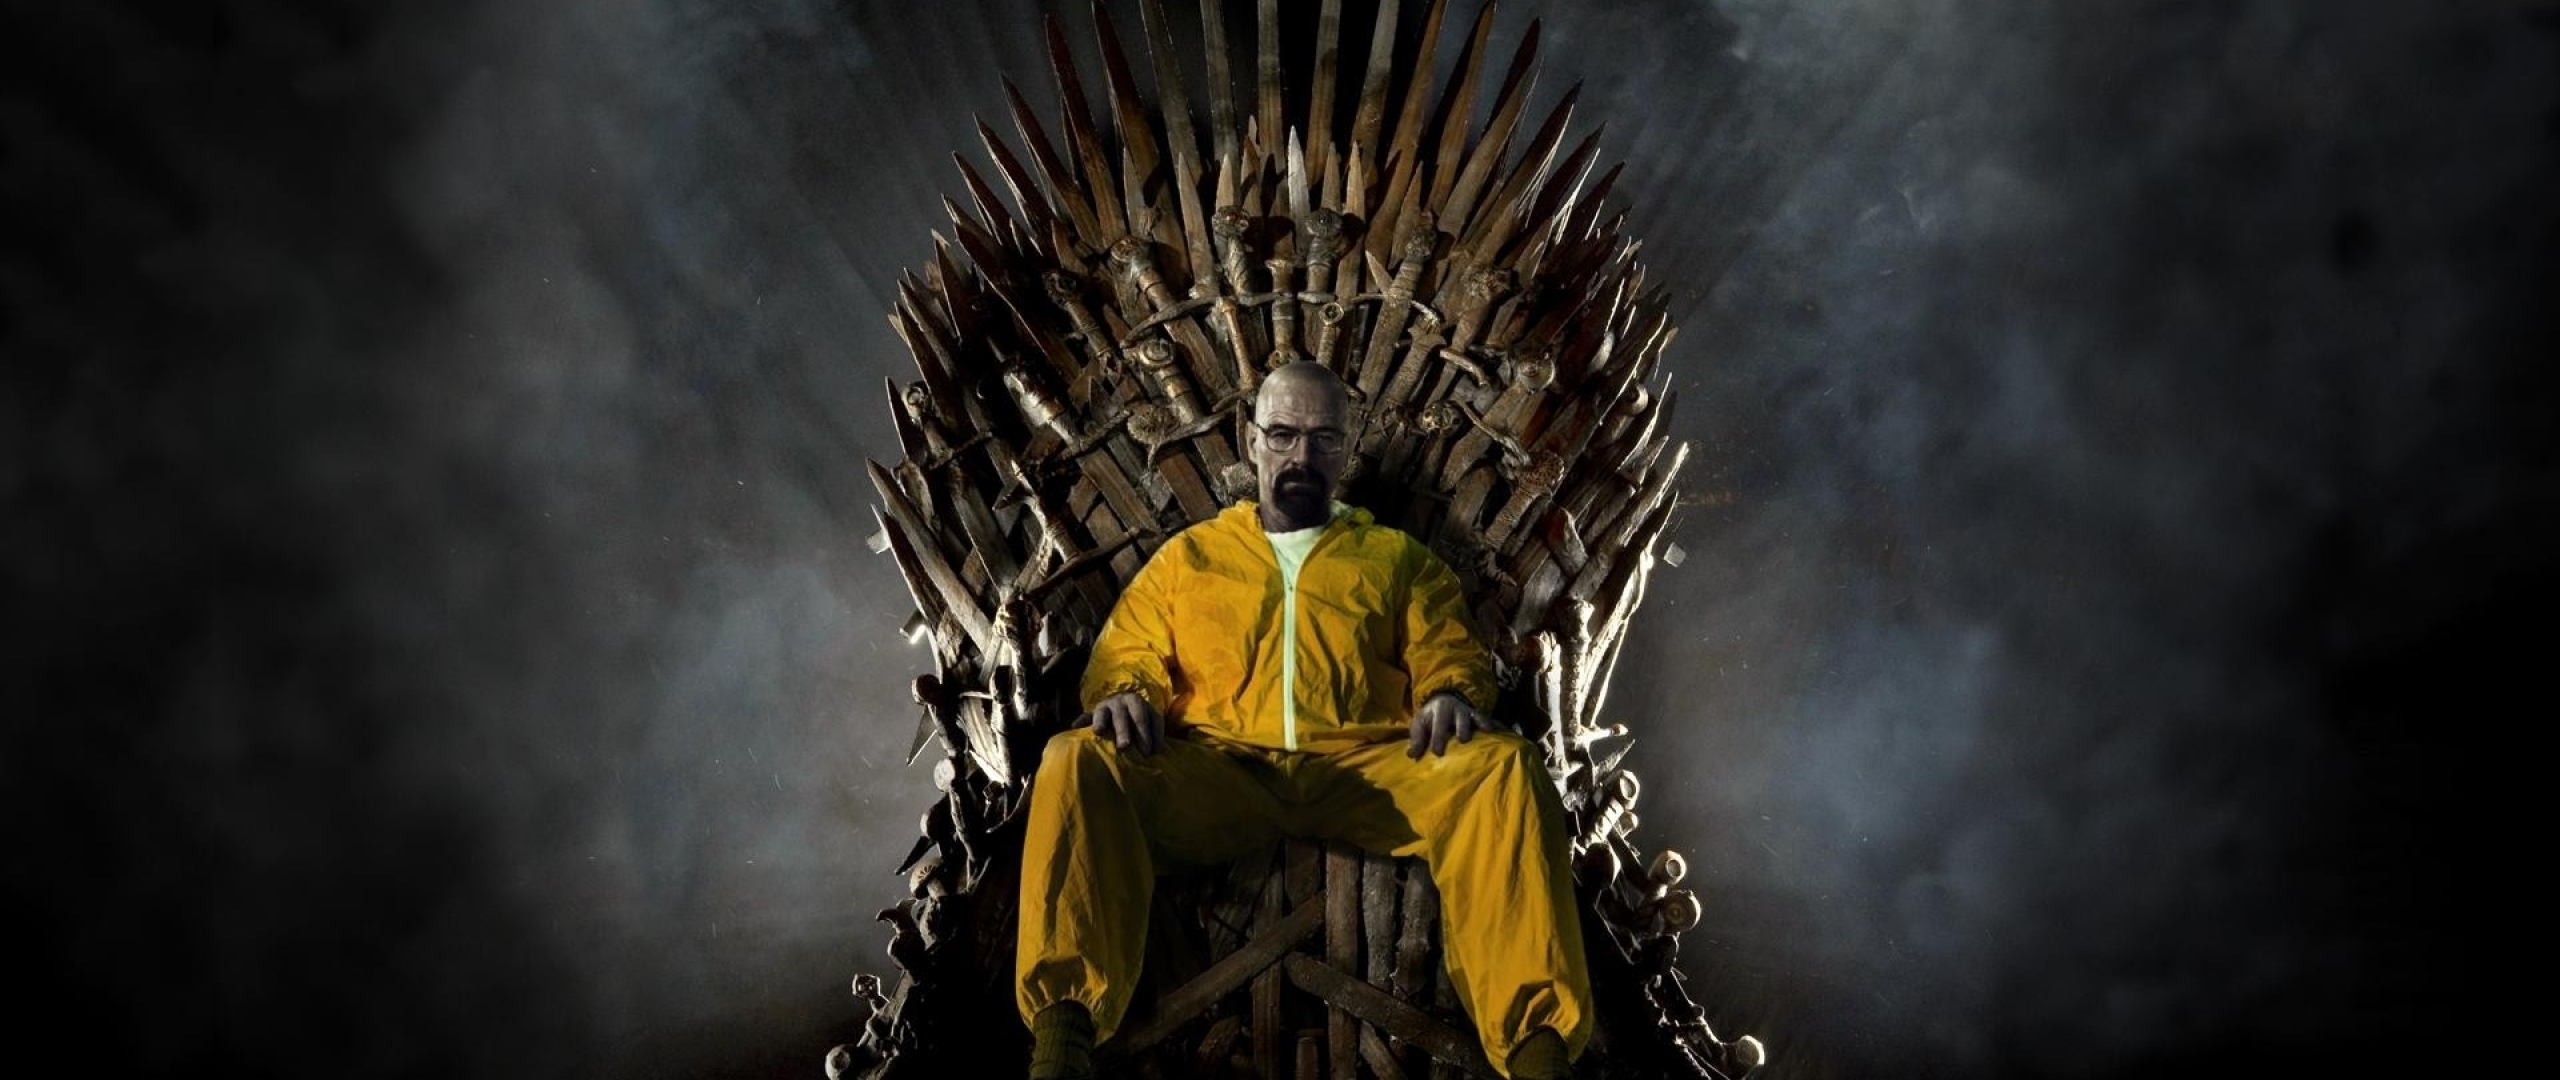 Breaking Bad Game Of Thrones Photoshoot, Full HD 2K Wallpaper